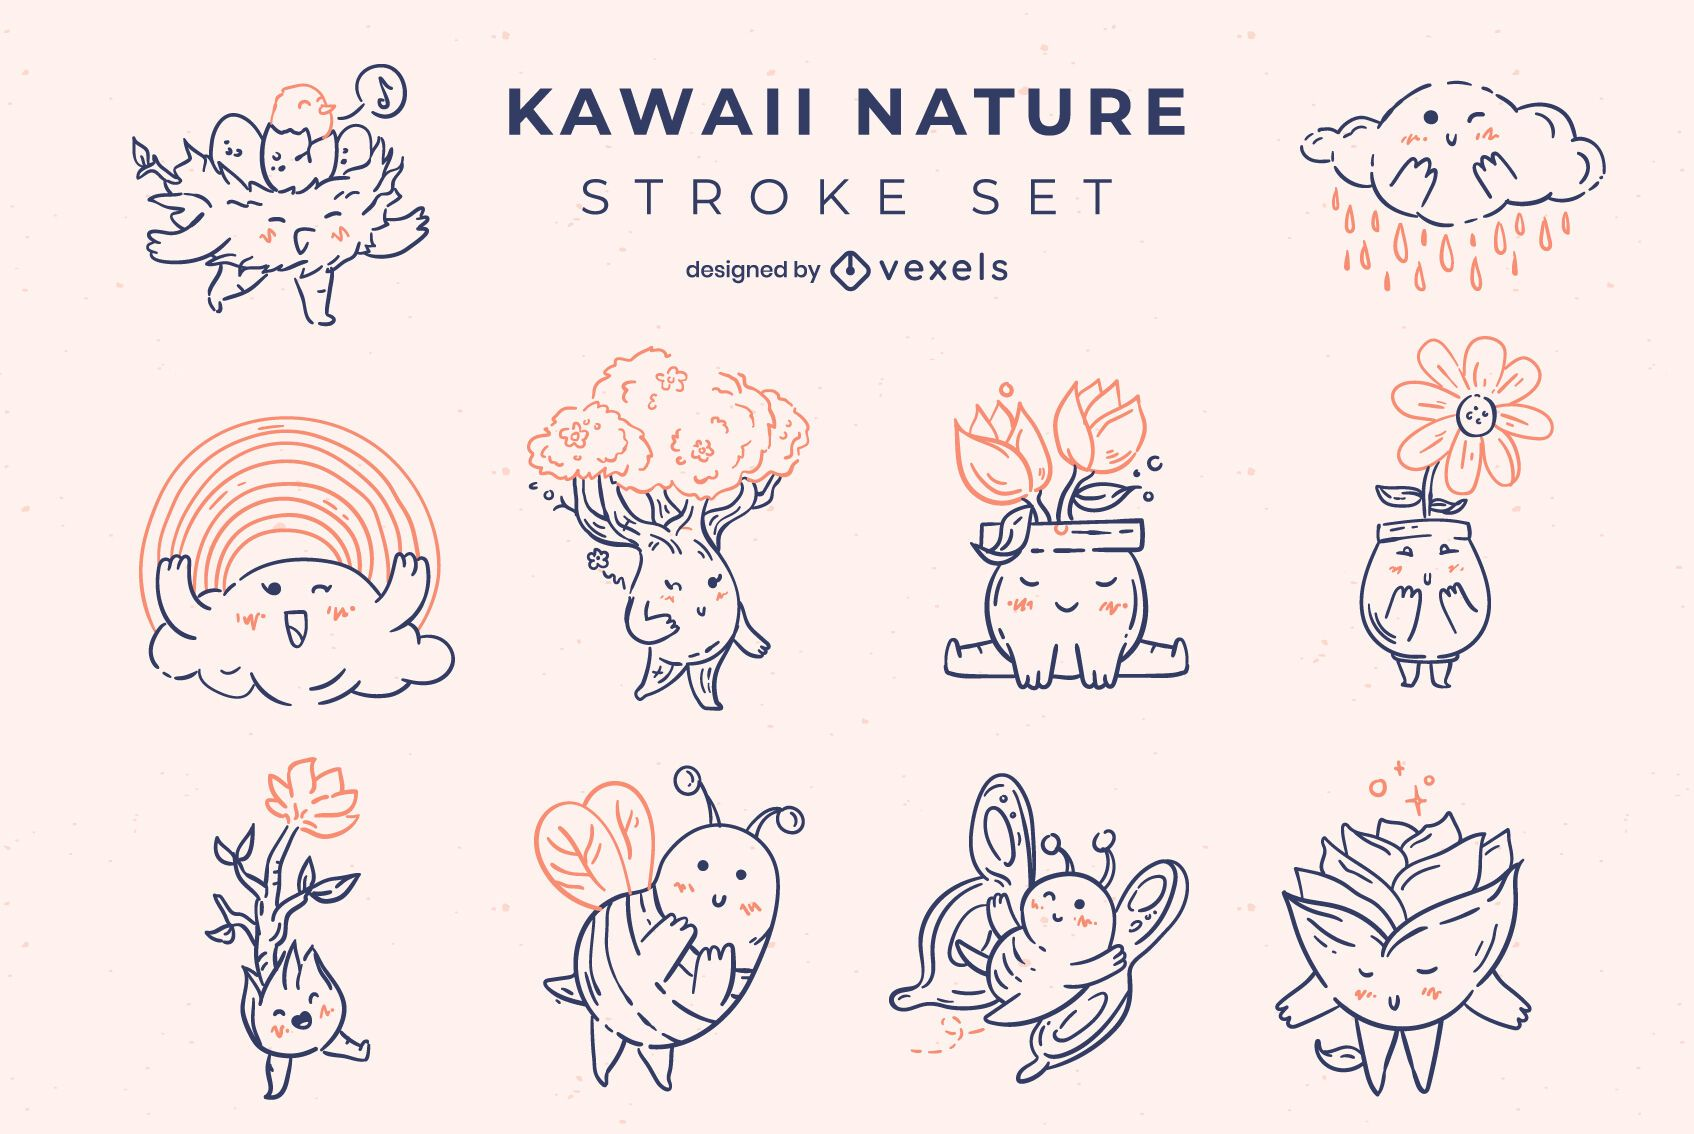 Conjunto de personajes de trazo de naturaleza kawaii